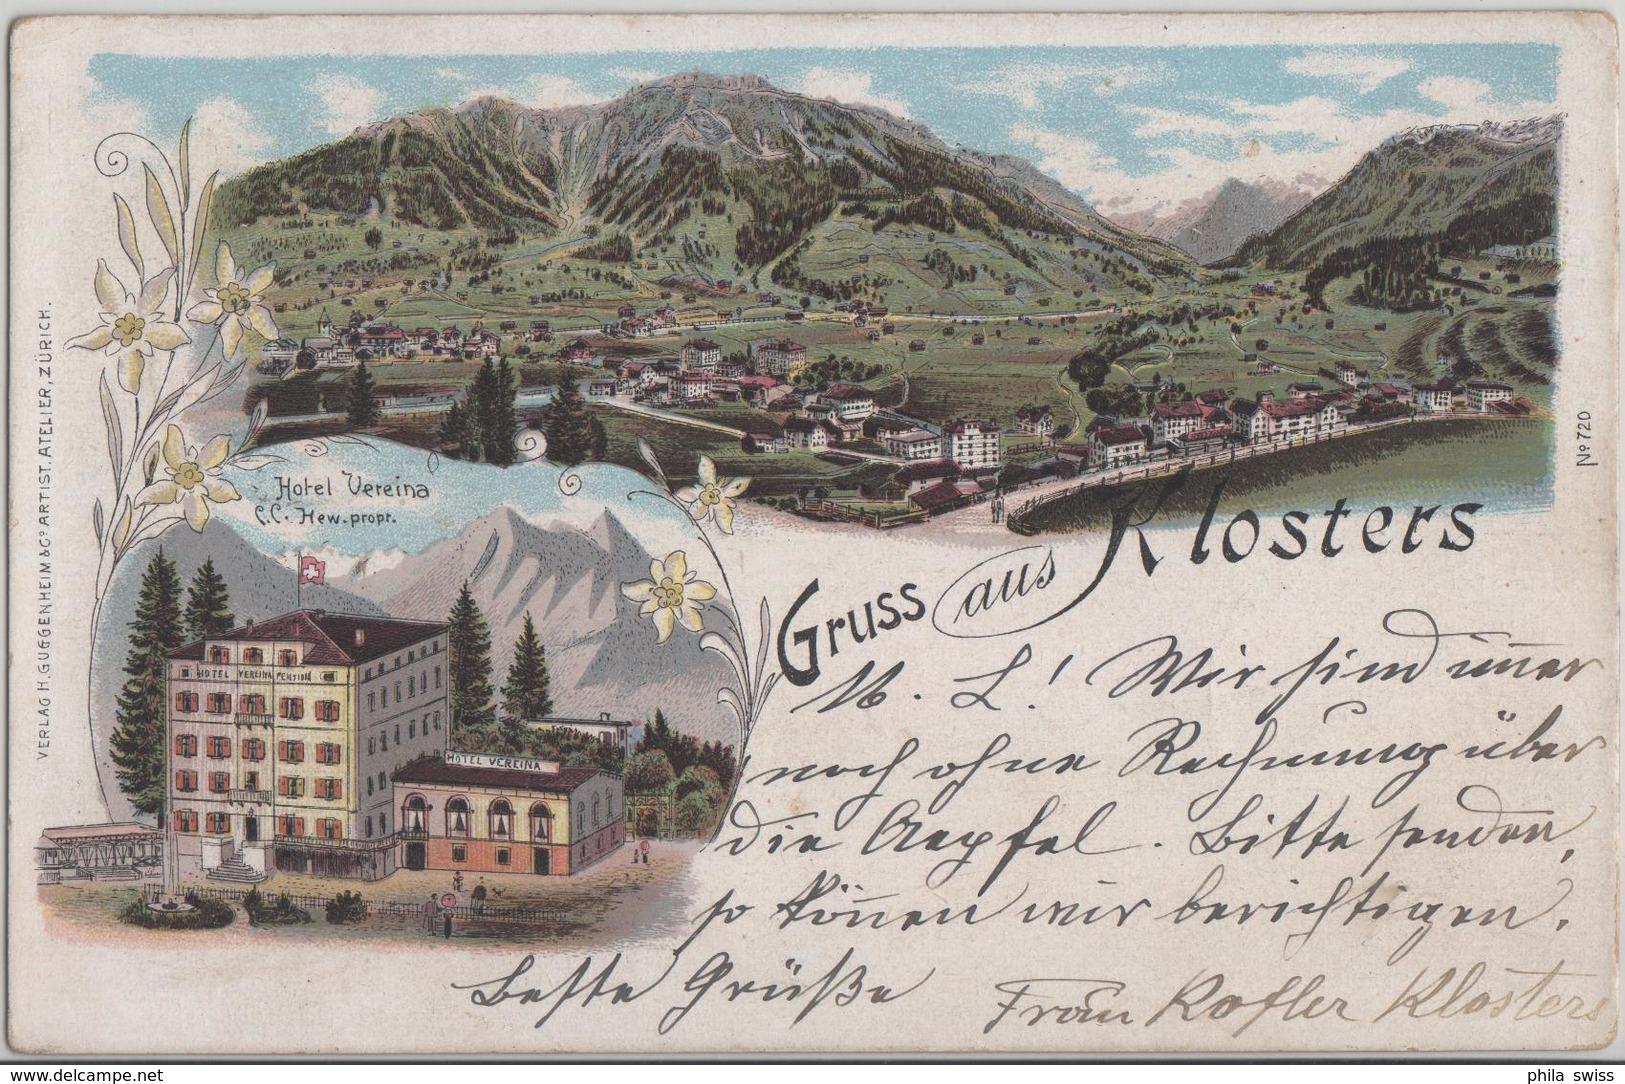 Gruss Aus Klosters - Hotel Vereina - Generalansicht - Litho Guggenheim No. 720 - GR Grisons